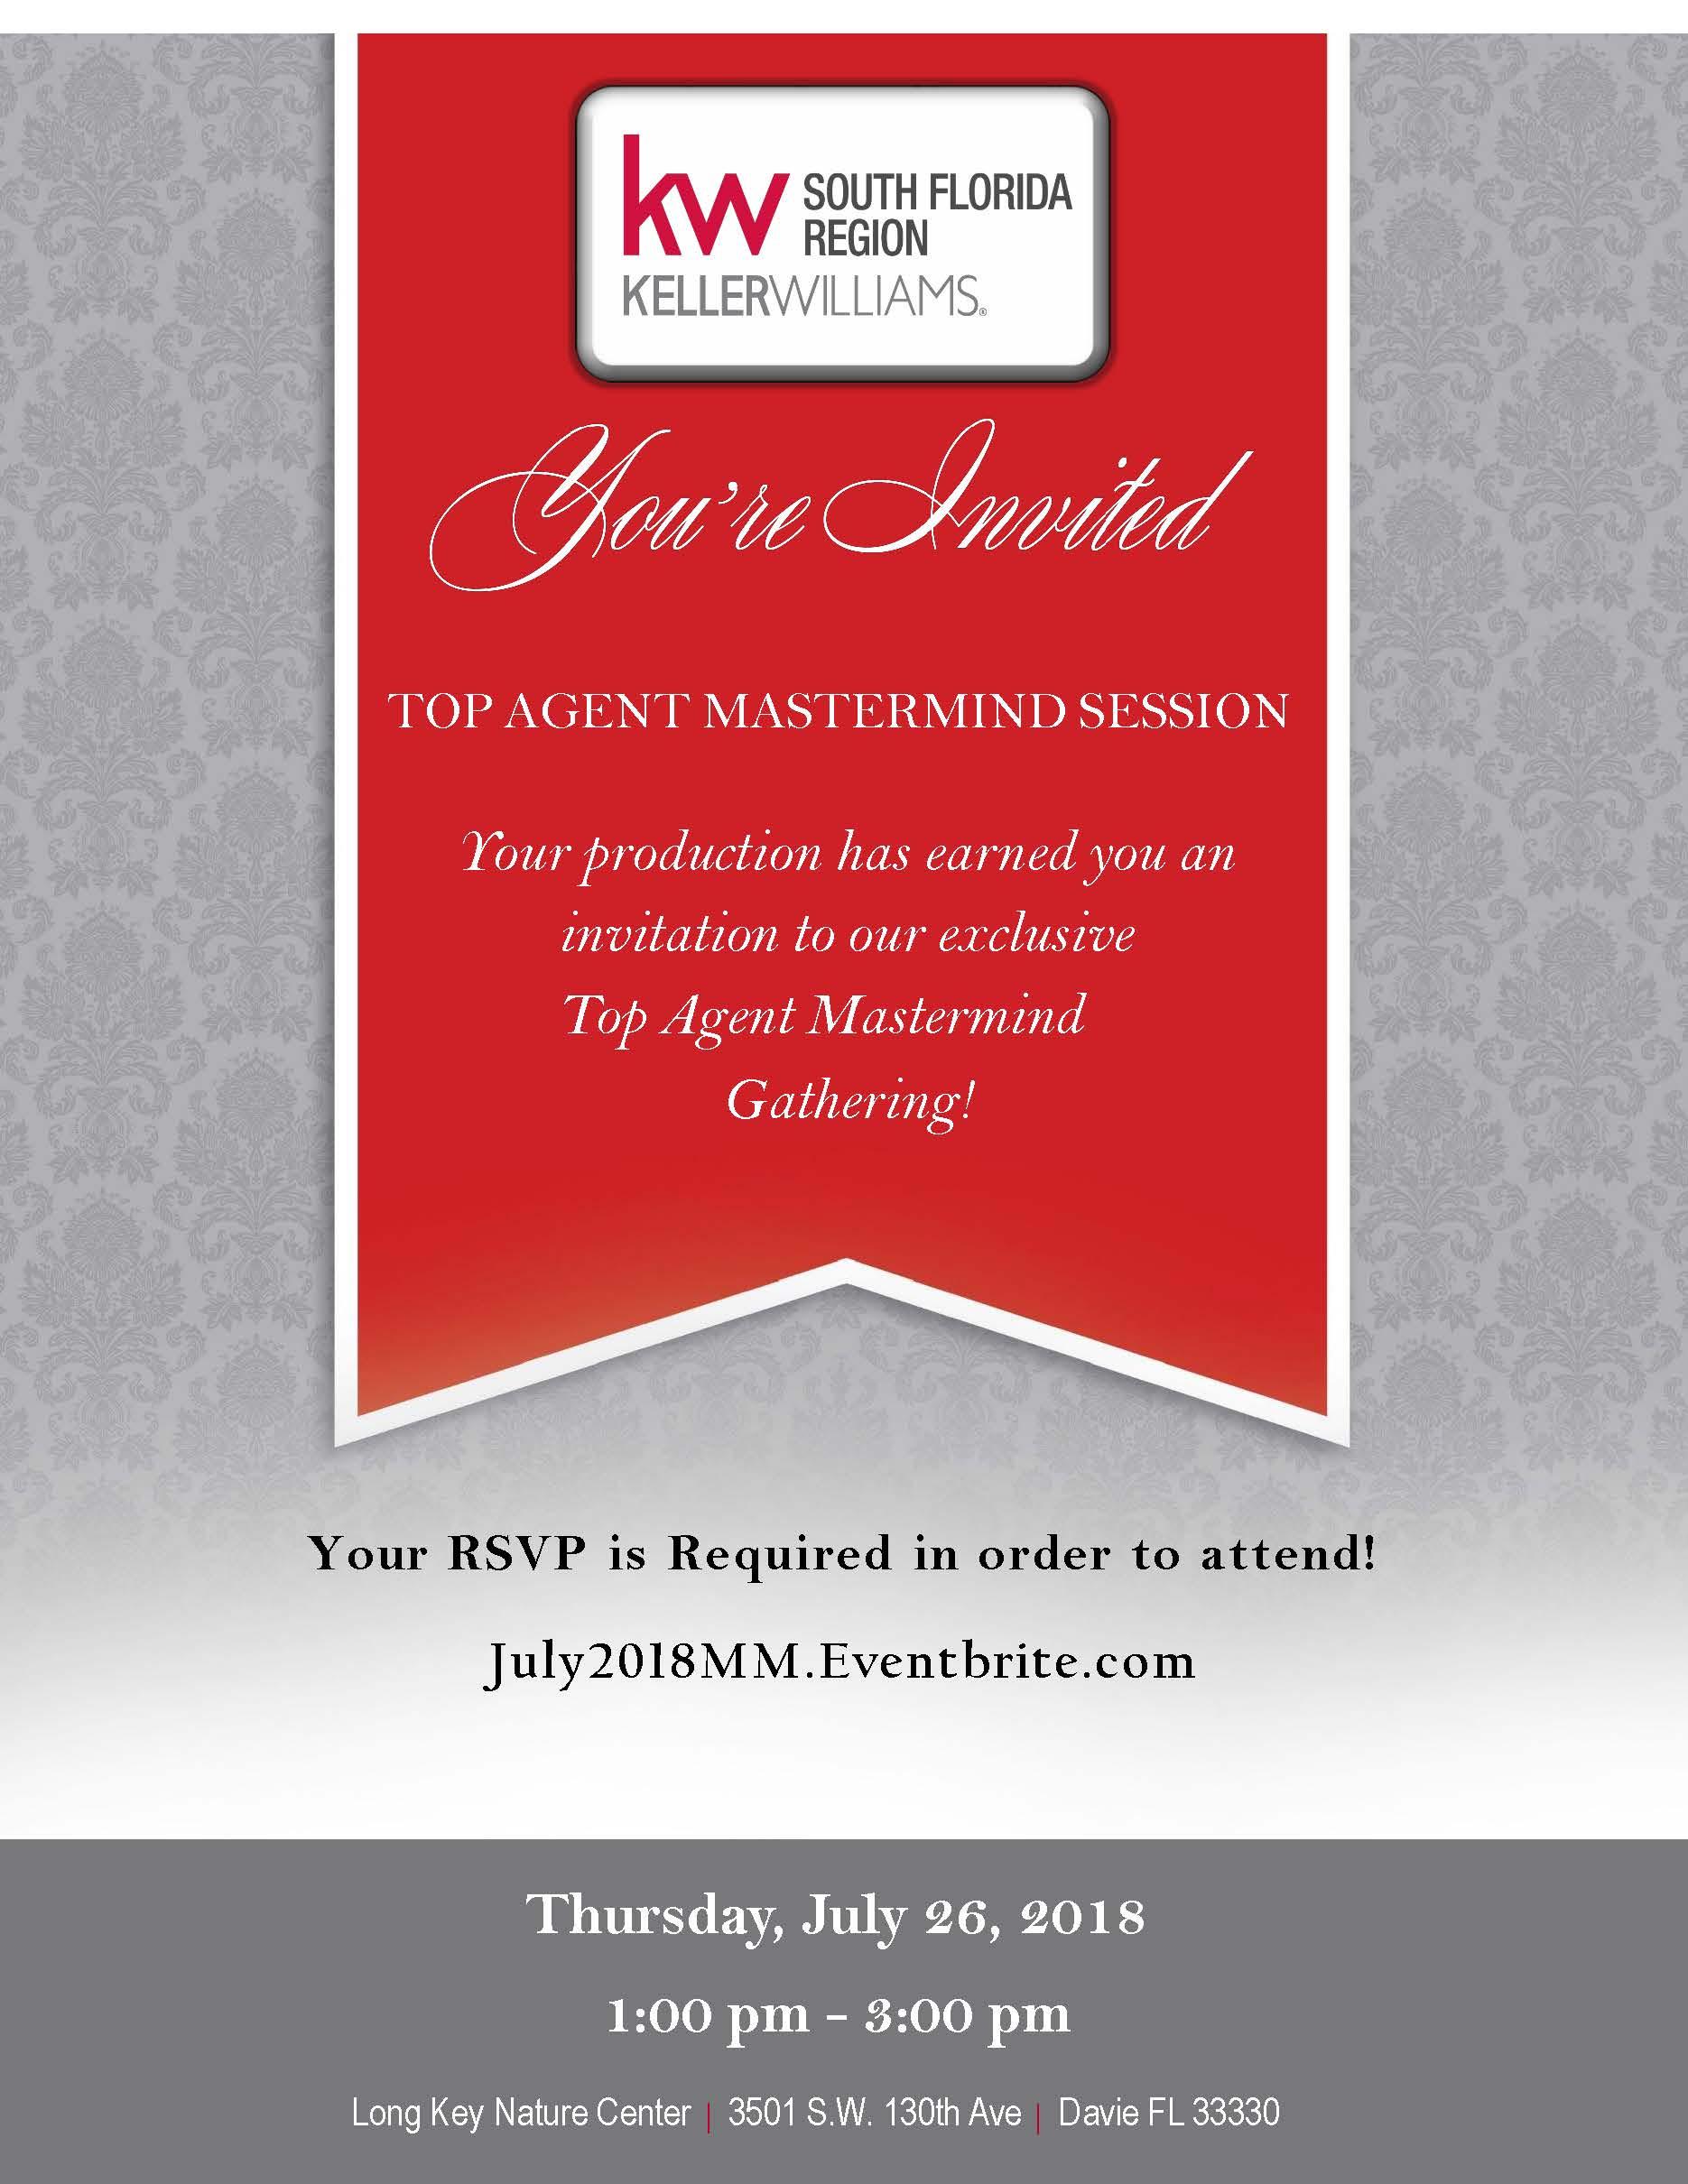 Top Agent Mastermind - Invitation Flyer - 7.26.18